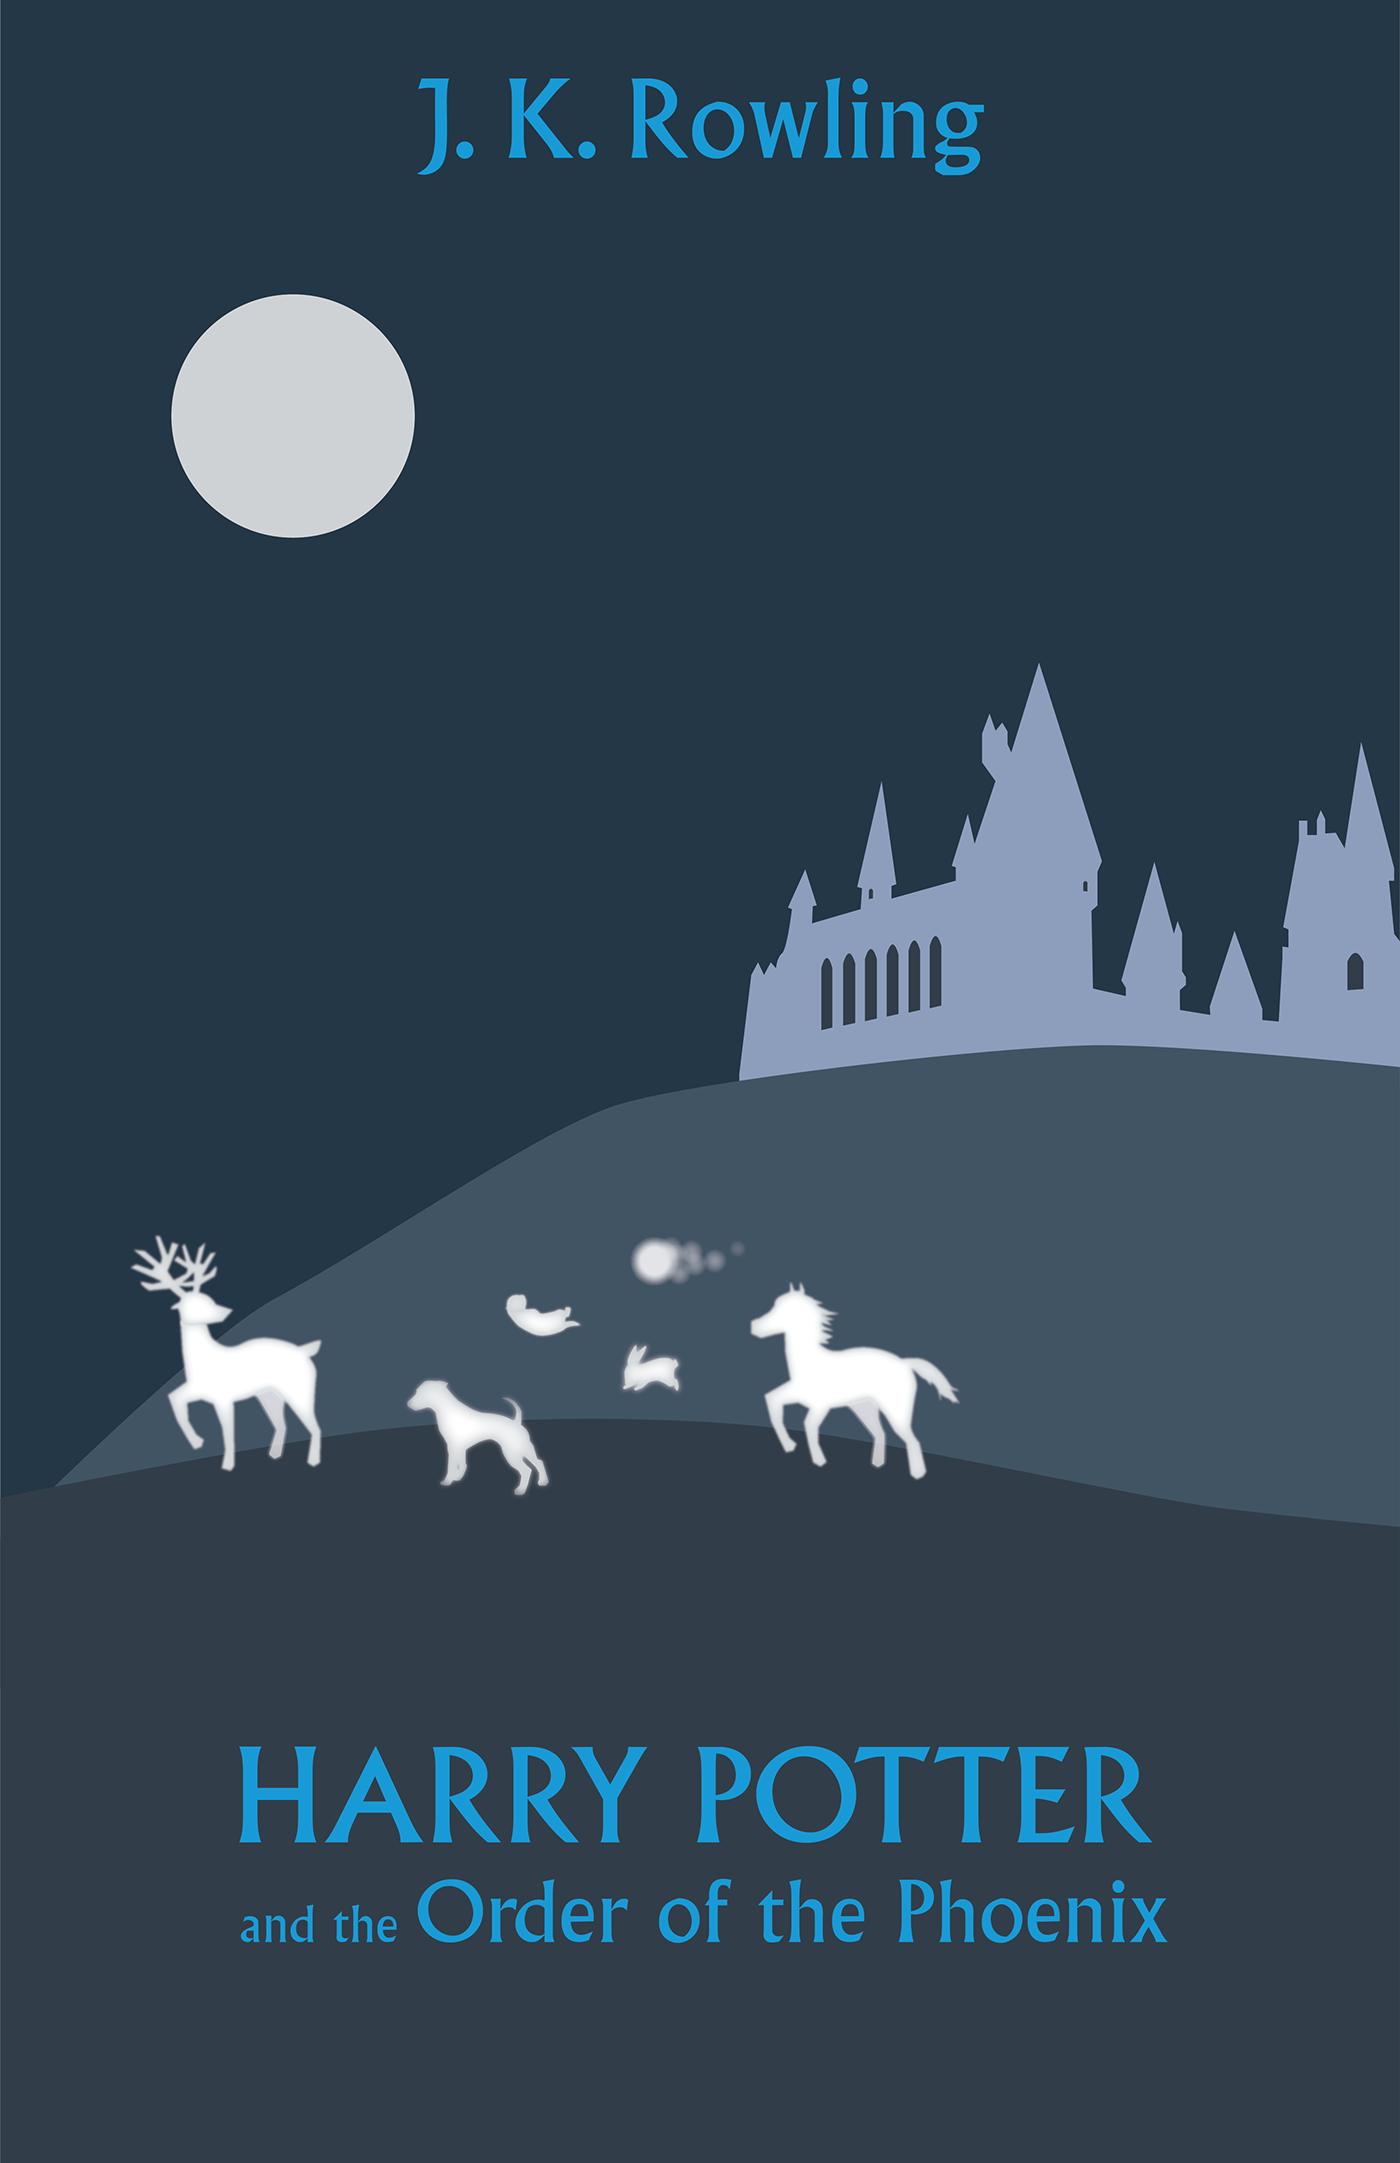 harry potter Hogwarts book cover poster vector ILLUSTRATION  student graphic design